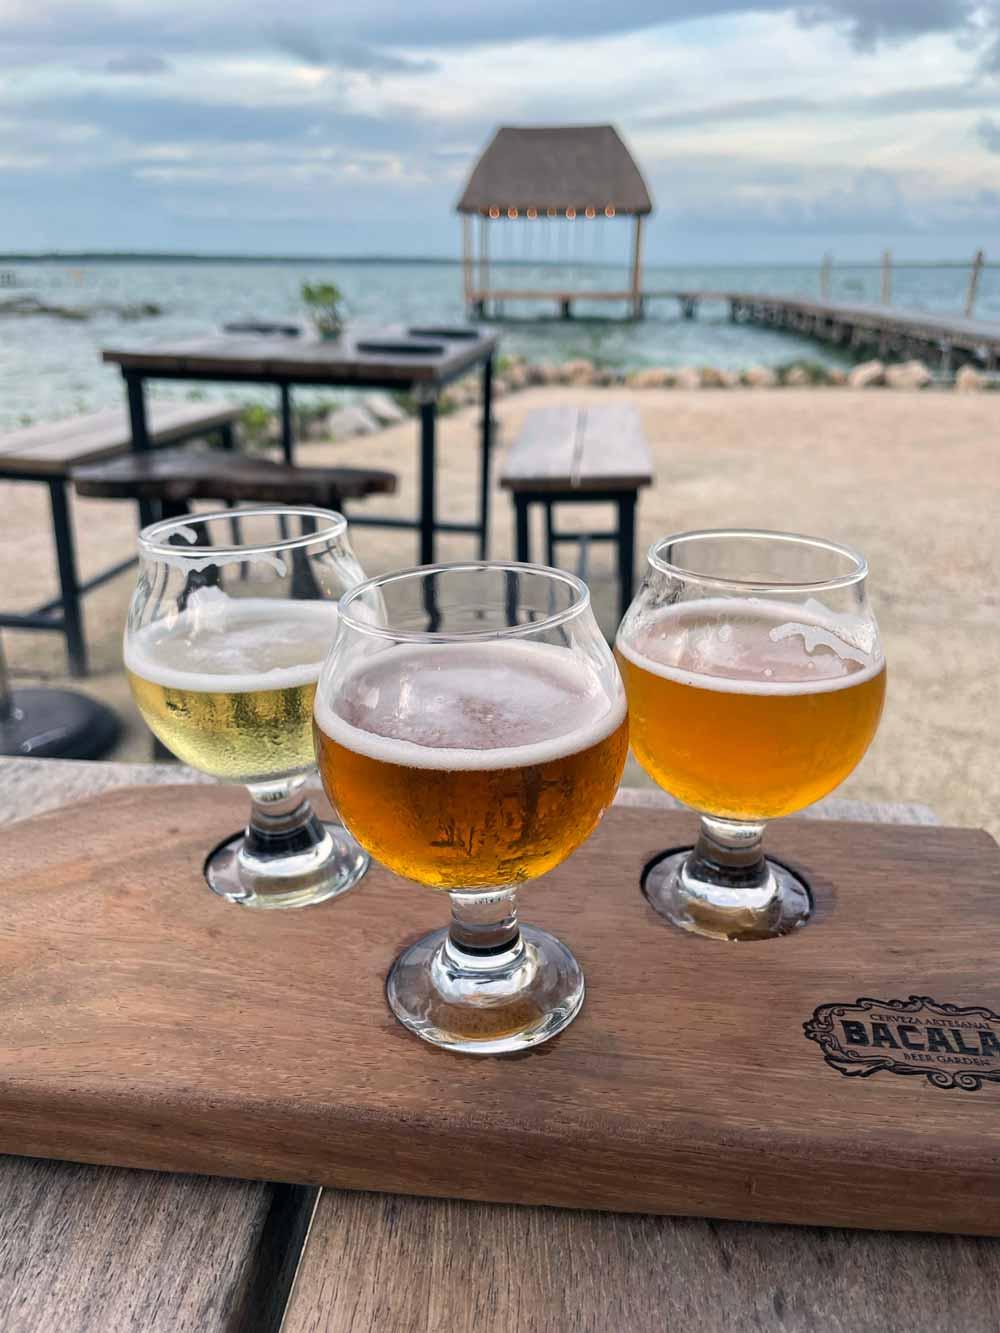 Bacalar-Brewery